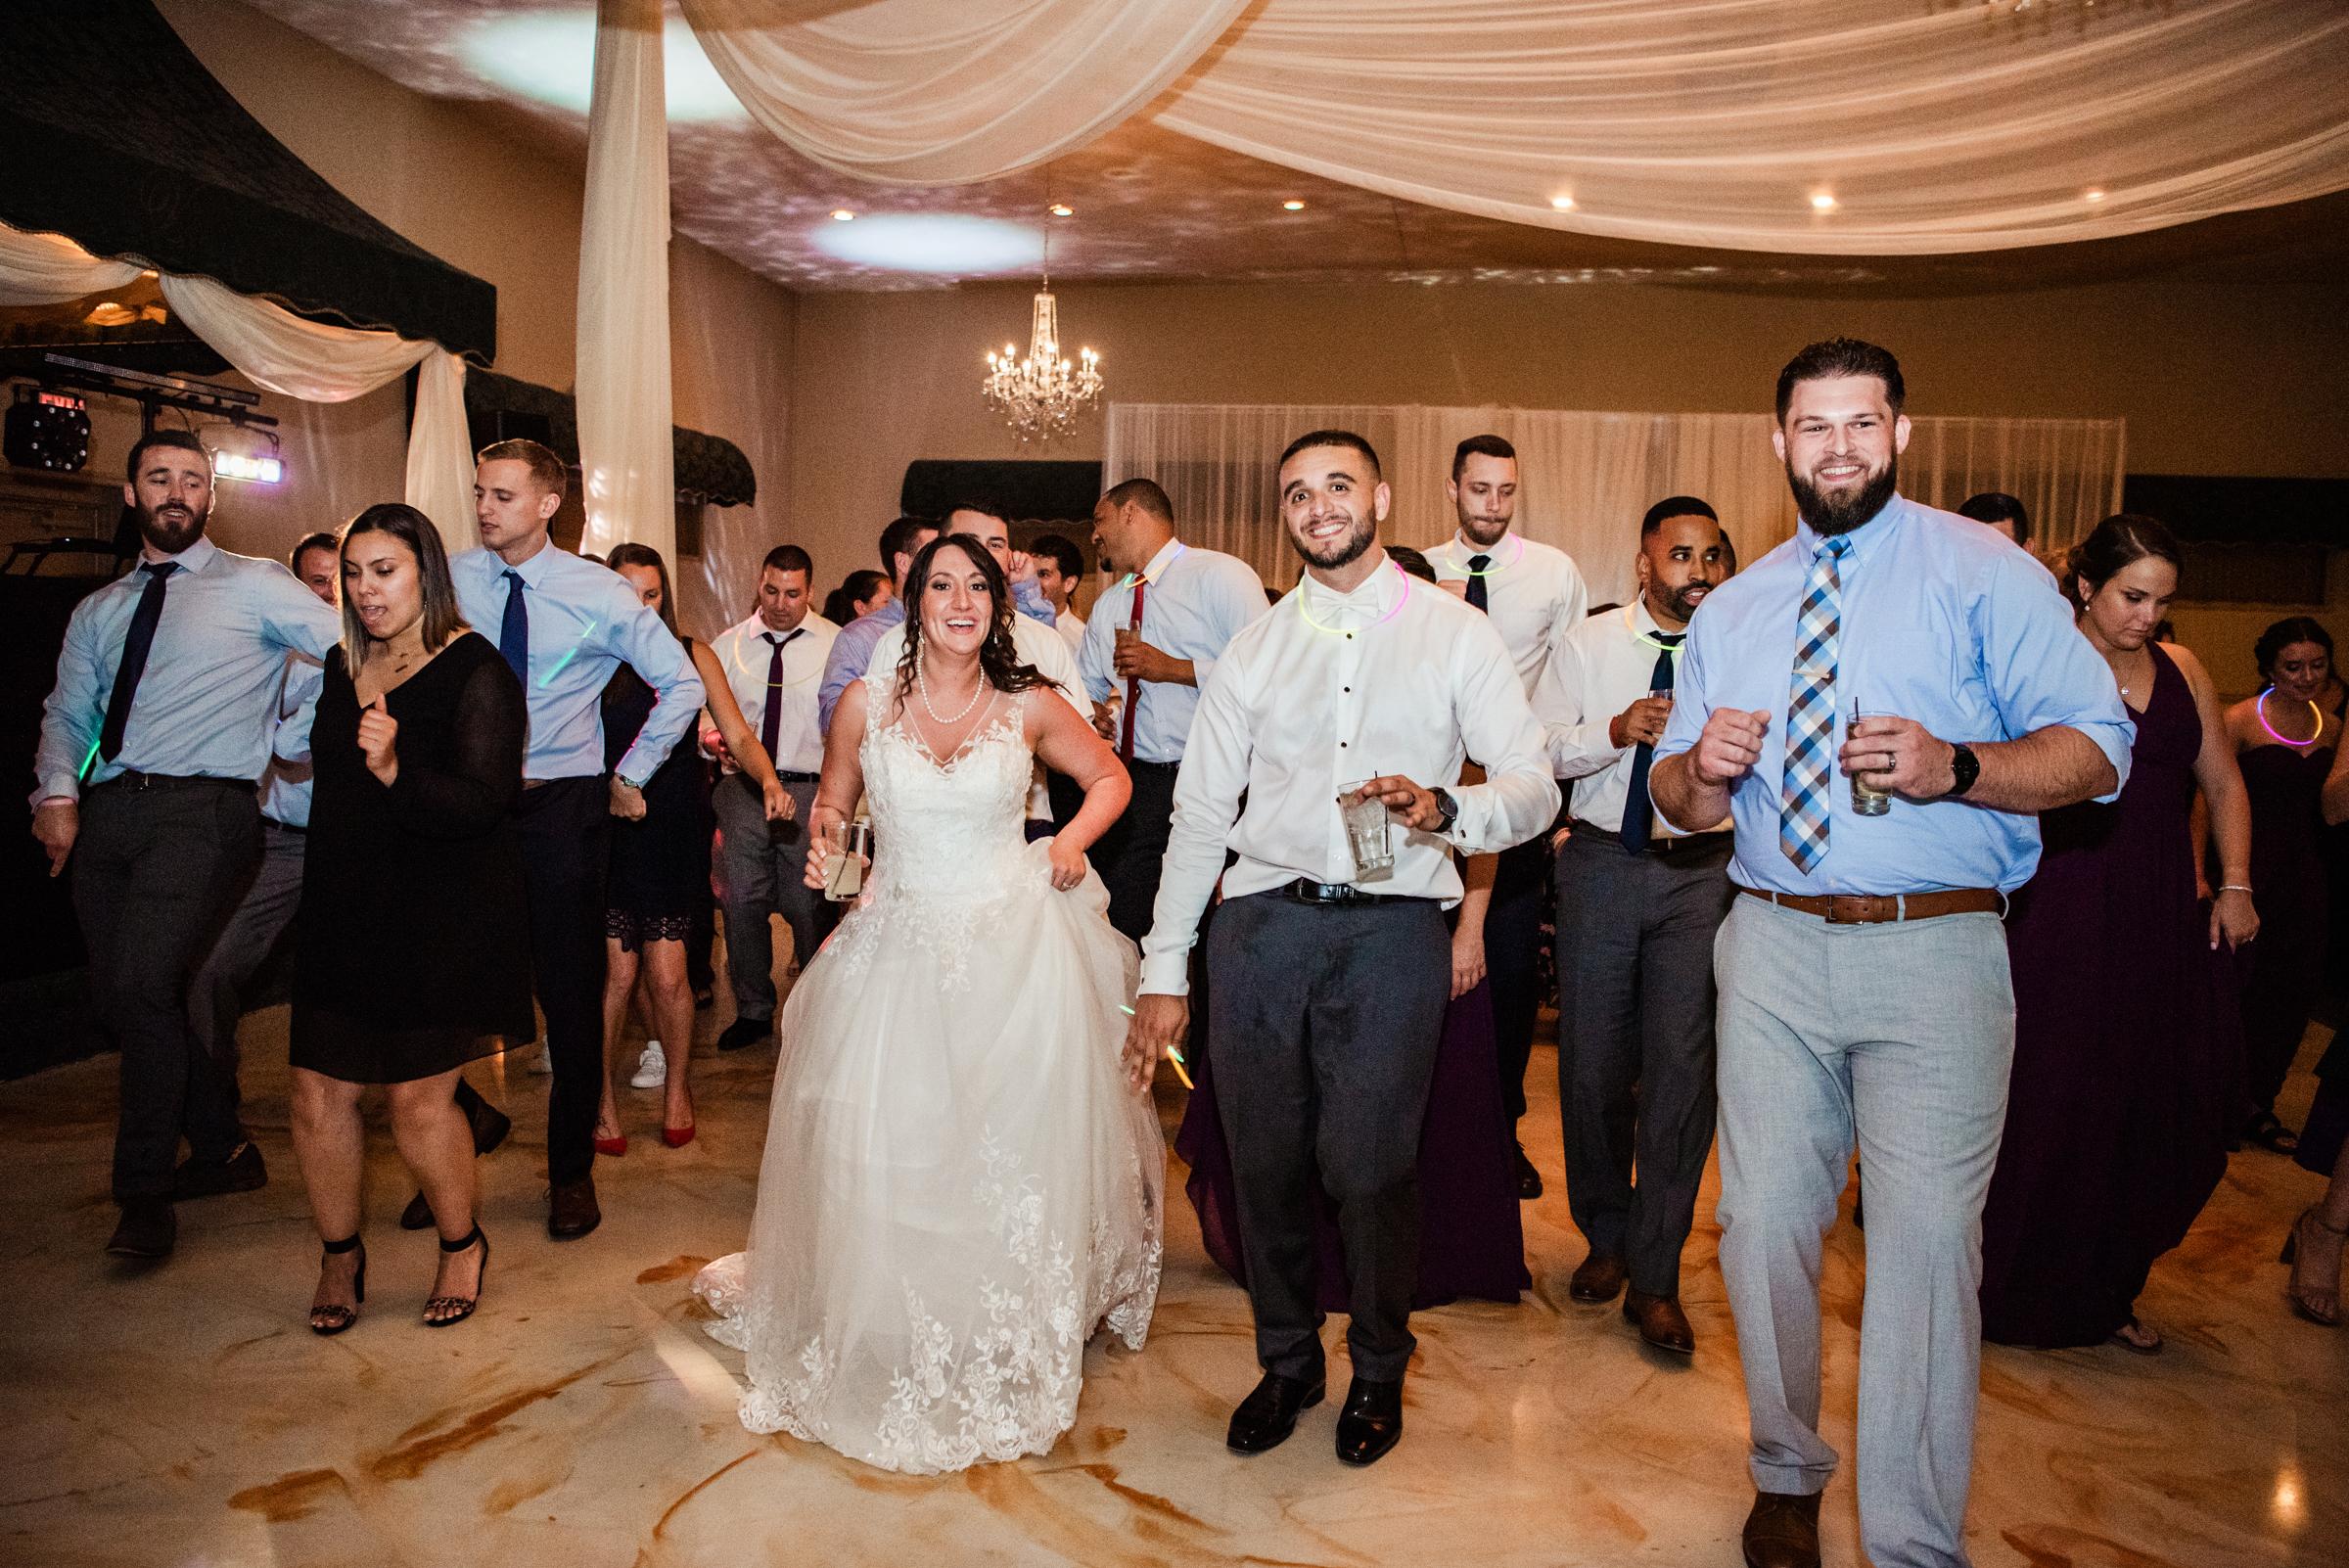 Historic_Old_St_Johns_Church_Valentinos_Banquet_Hall_Central_NY_Wedding_JILL_STUDIO_Rochester_NY_Photographer_DSC_7124.jpg